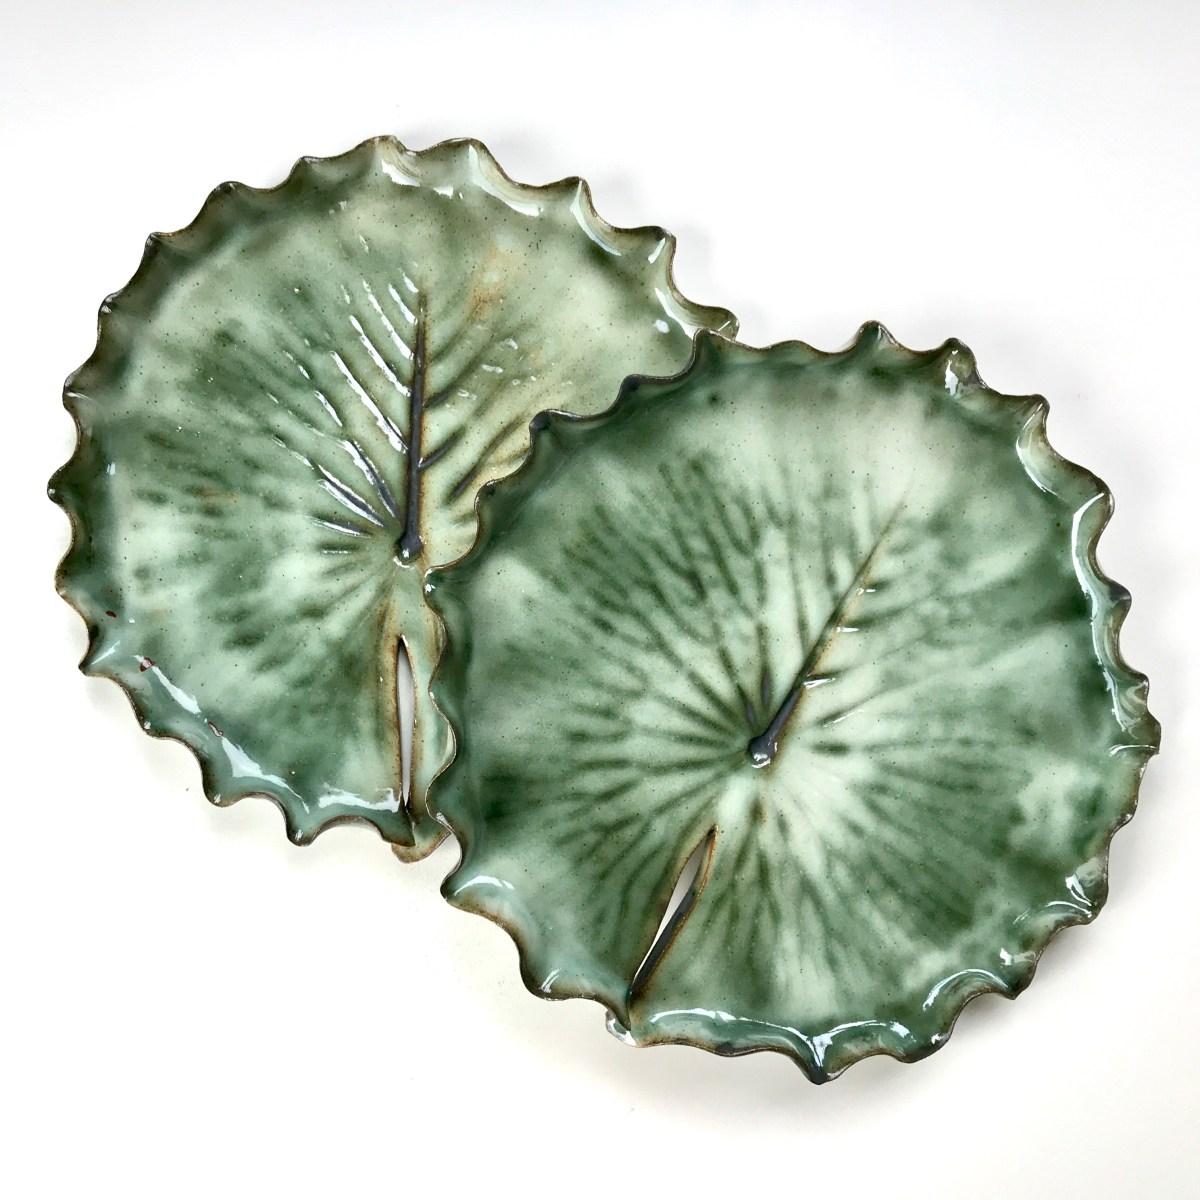 Pair of Pond Lily Leaf Dessert Dishes by Sonya Ceramic Art